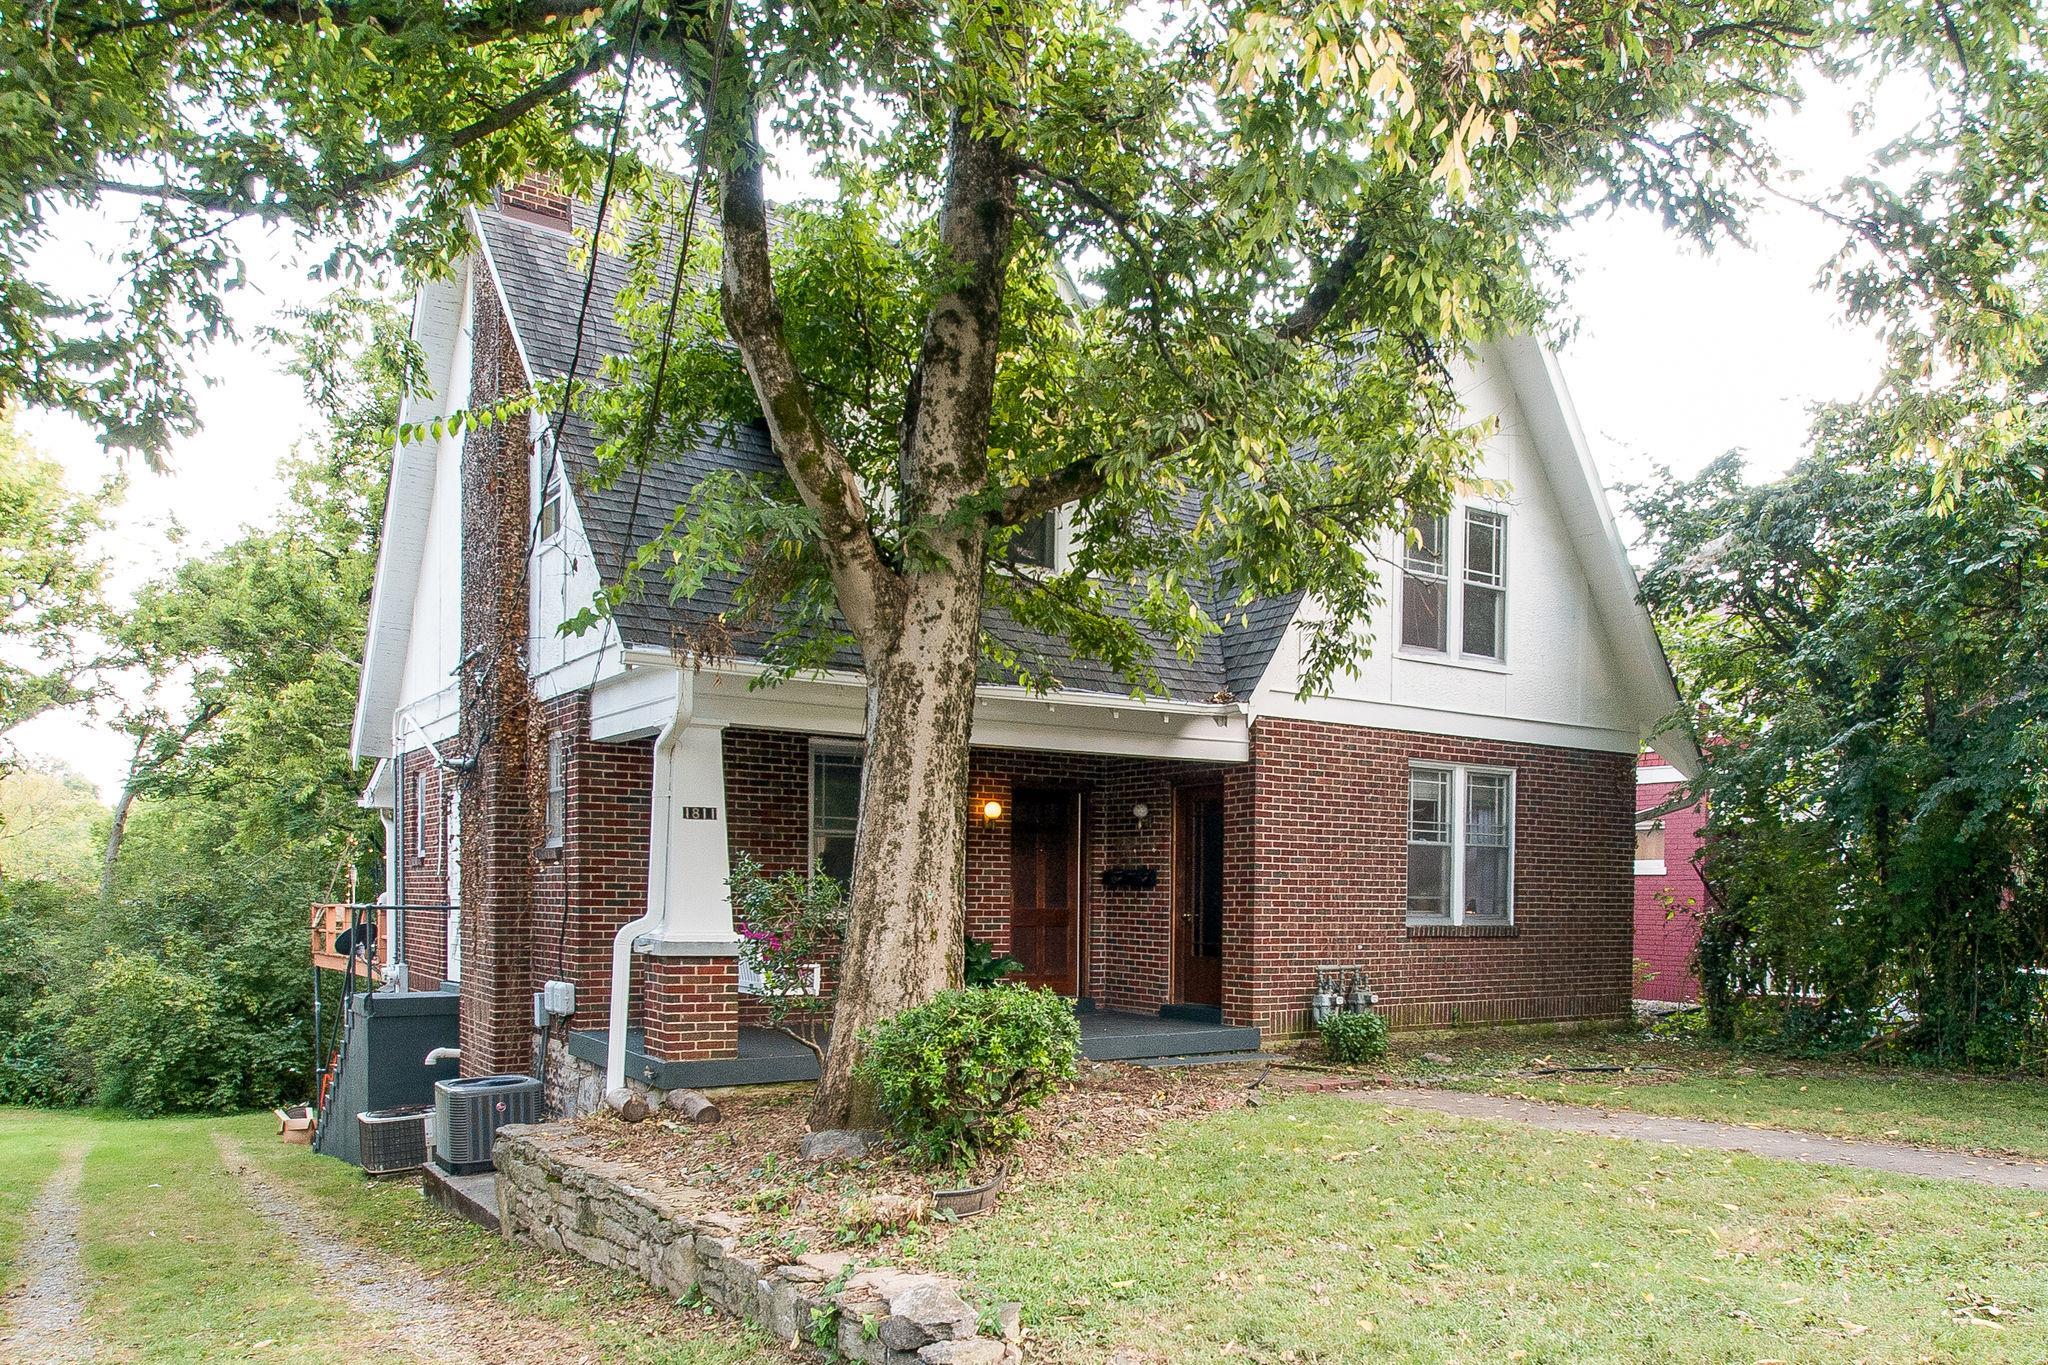 1811 Beechwood Ave, Nashville, TN 37212 - Nashville, TN real estate listing